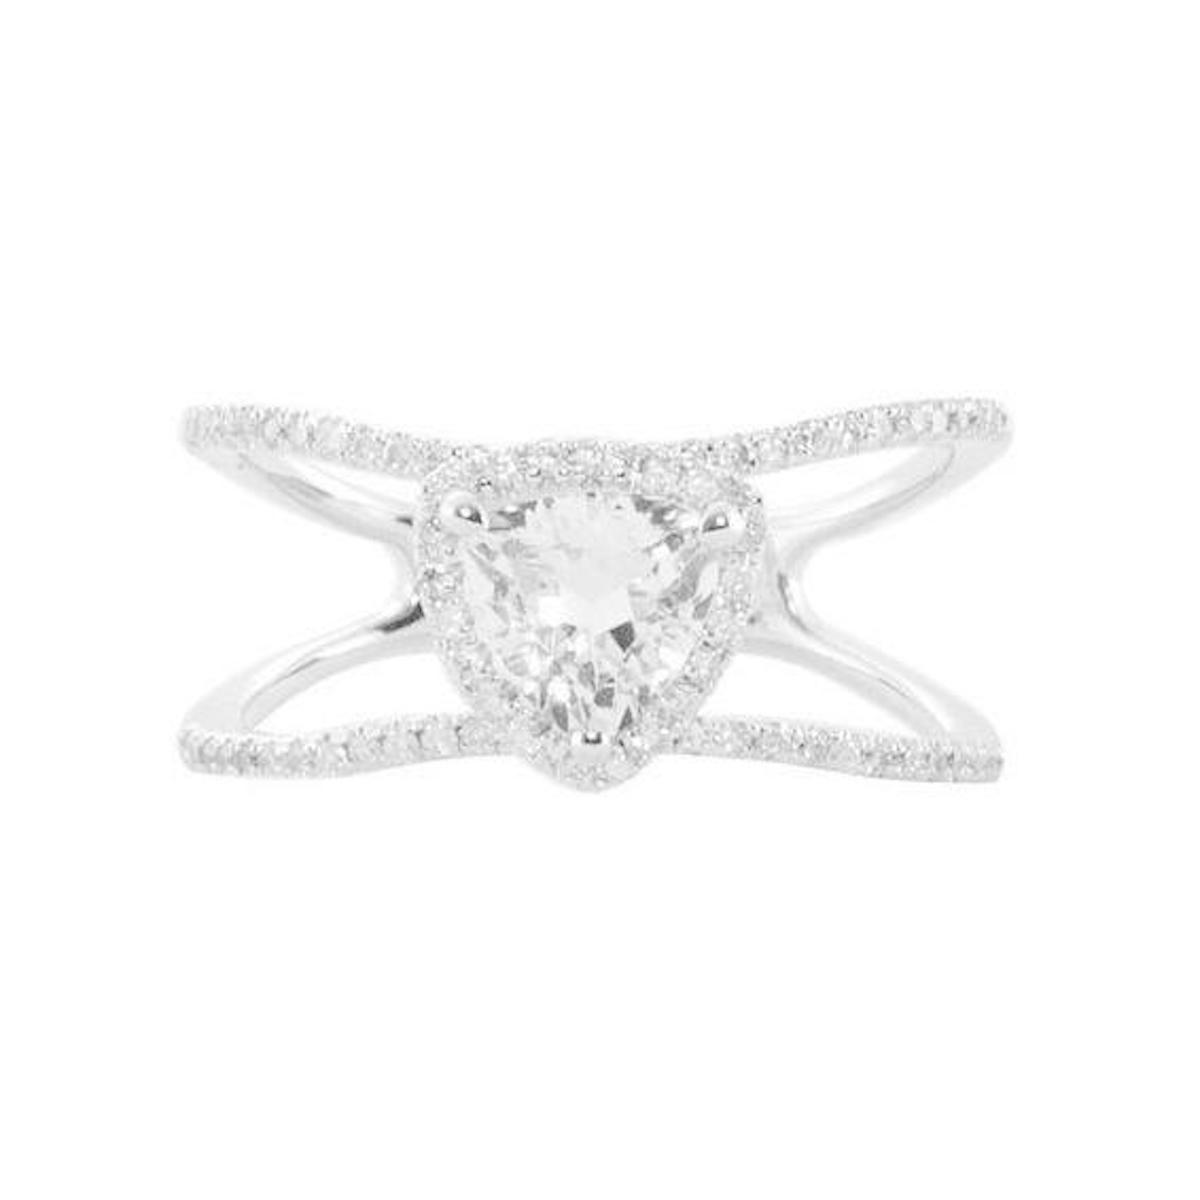 Luna Skye Gold and Diamond Double Band Topaz Trillion Ring